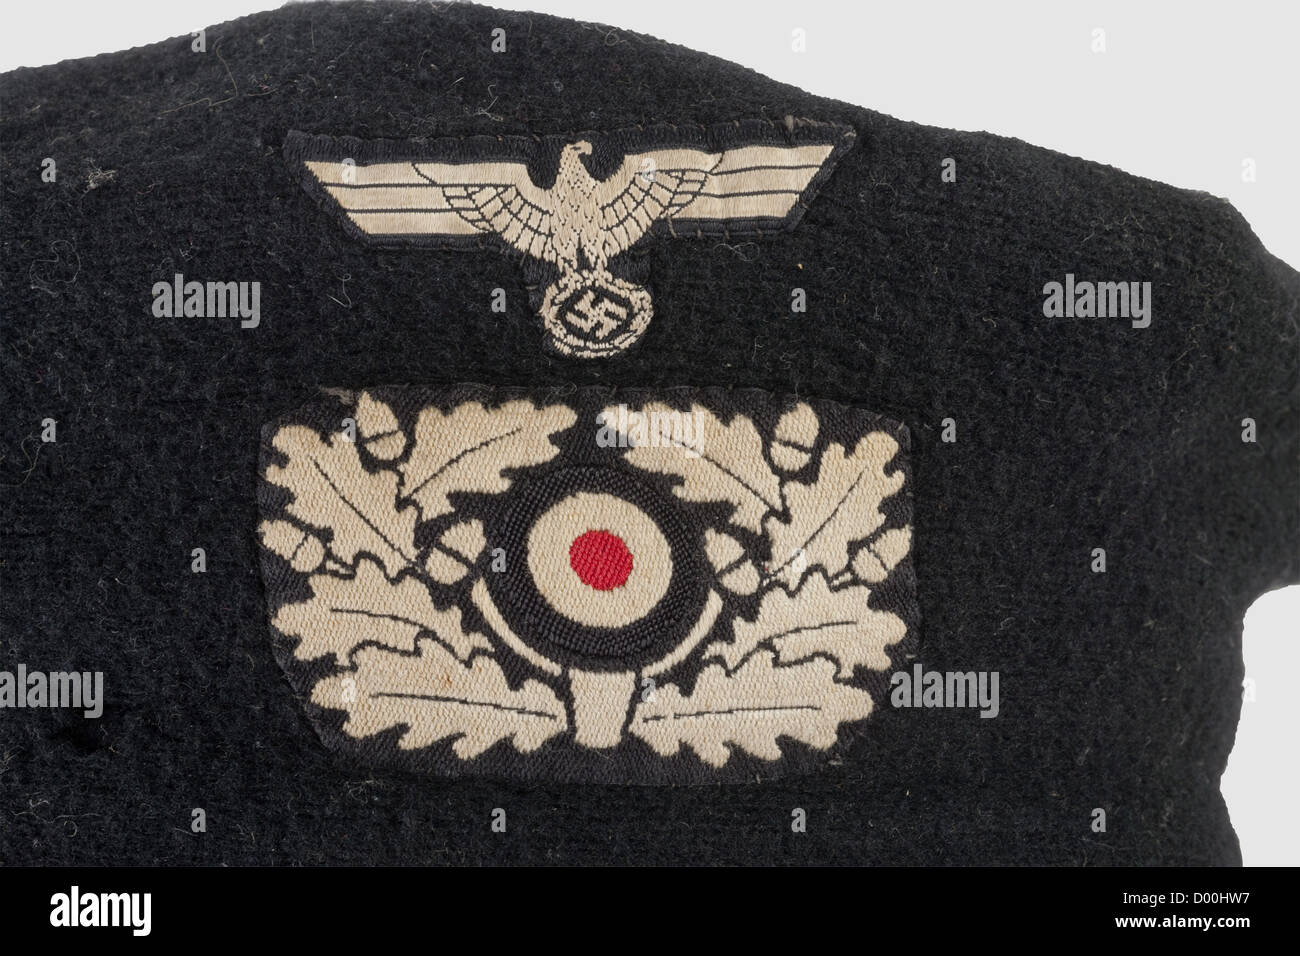 Una boina para el uniforme de propósito especial de tropas Panzer ... 8a4048a0392